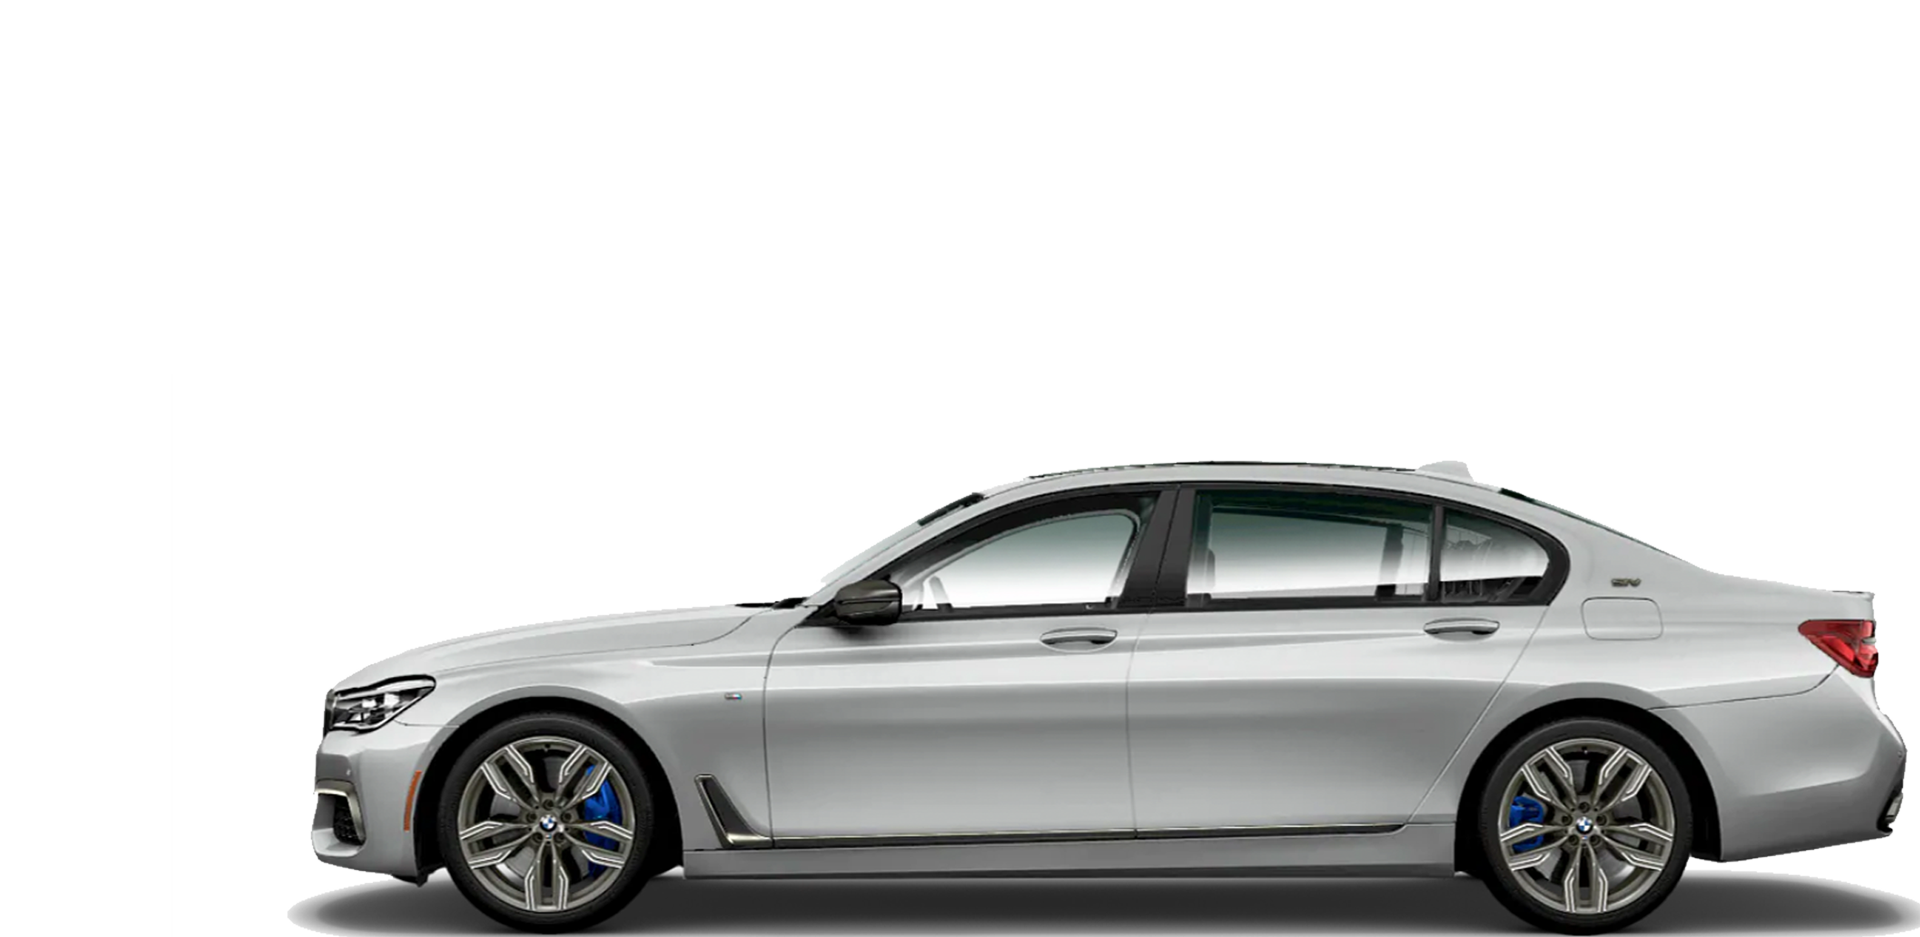 7 Series BMW Century West BMW